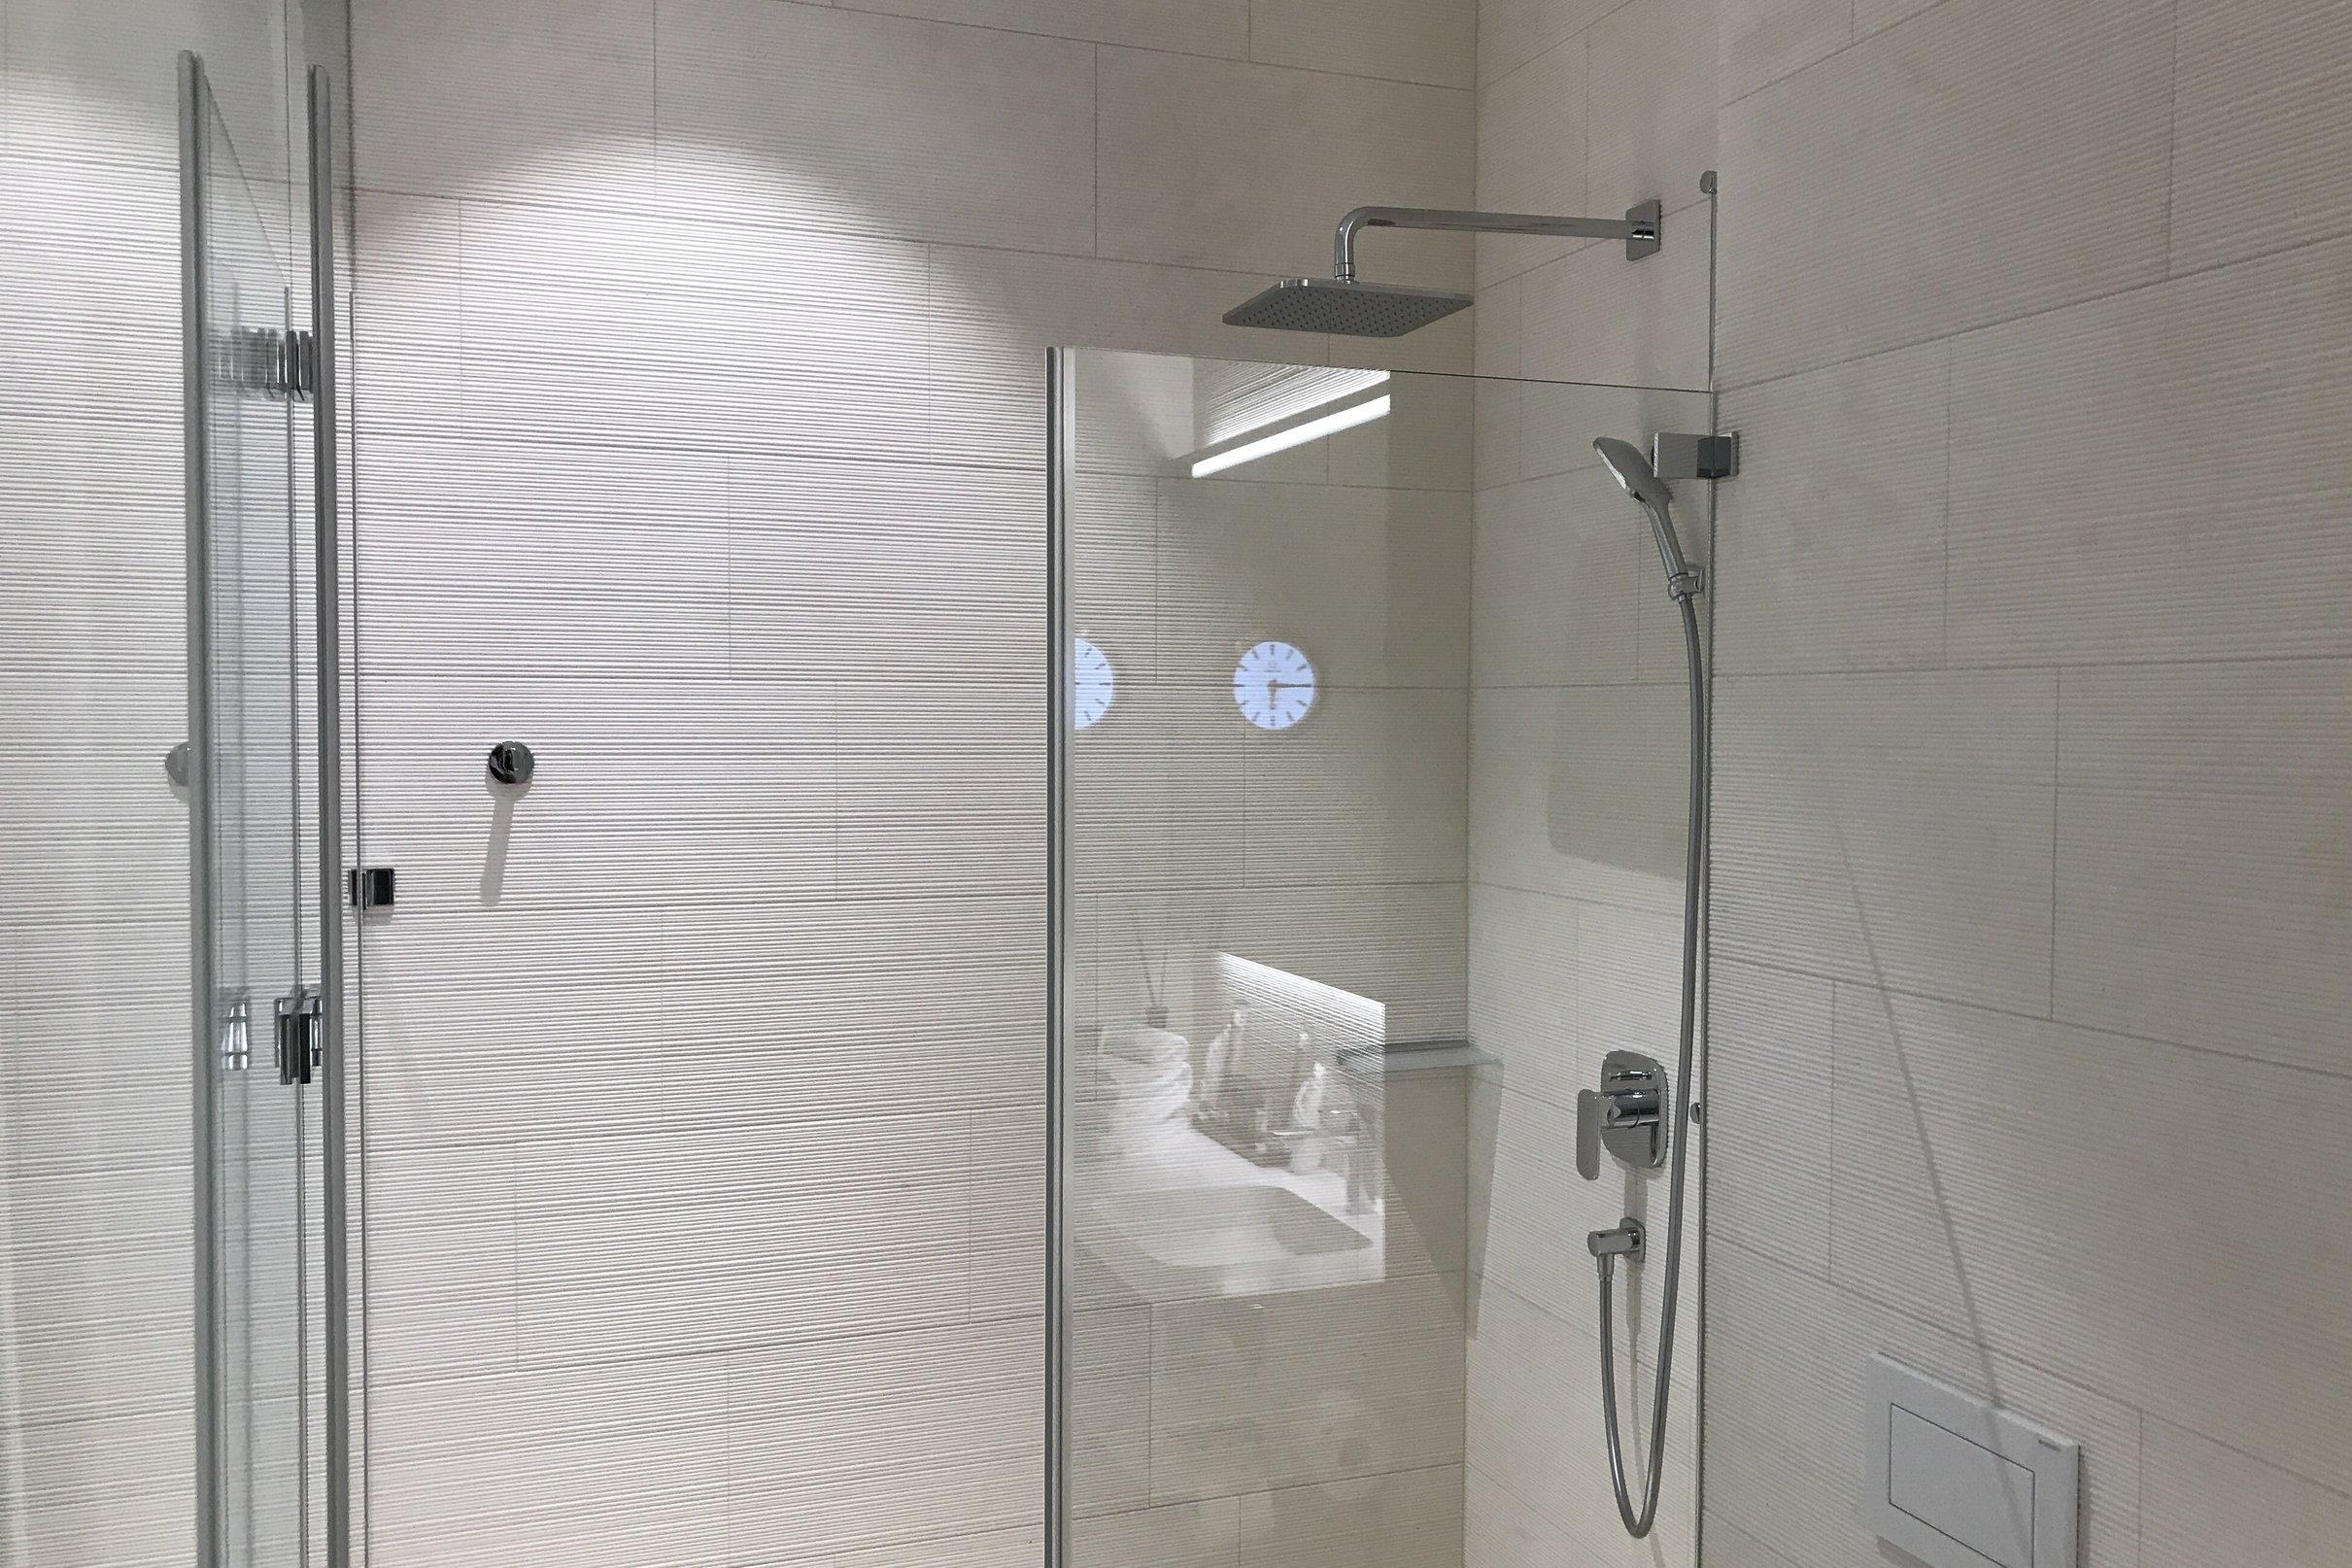 Swiss First Class Lounge Zurich – Day room shower